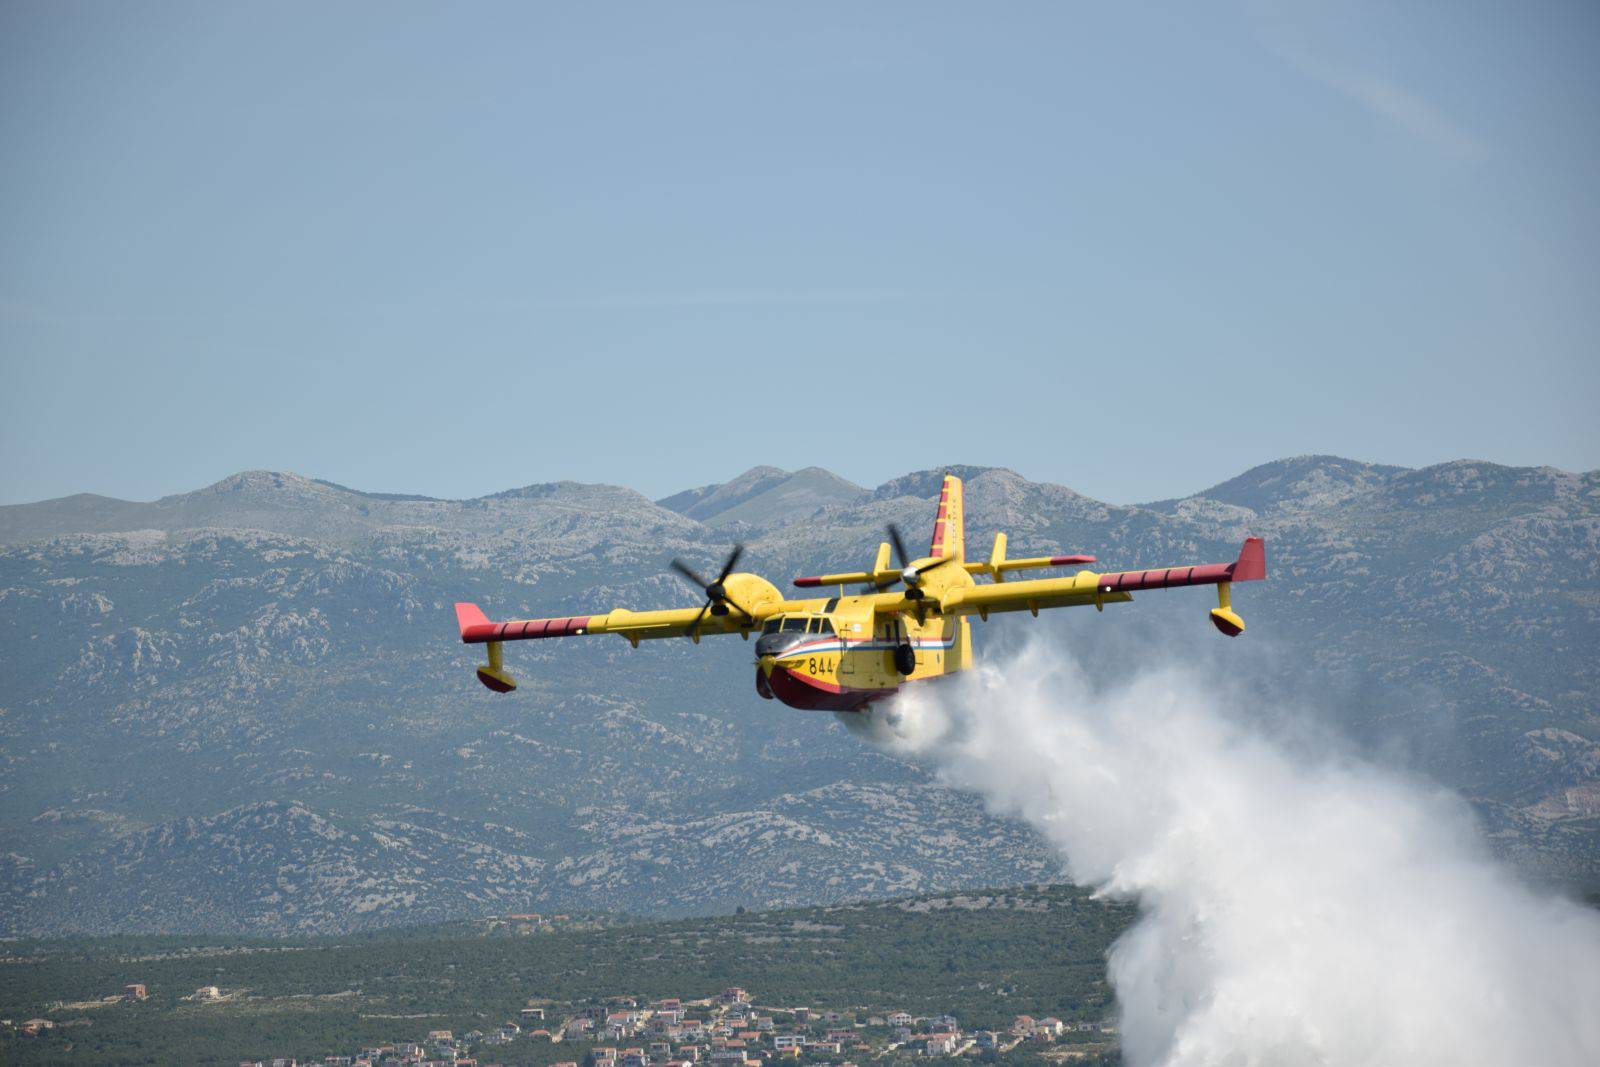 Gori kod Drniša: Požar gase i dva kanadera, jedan aitractor...